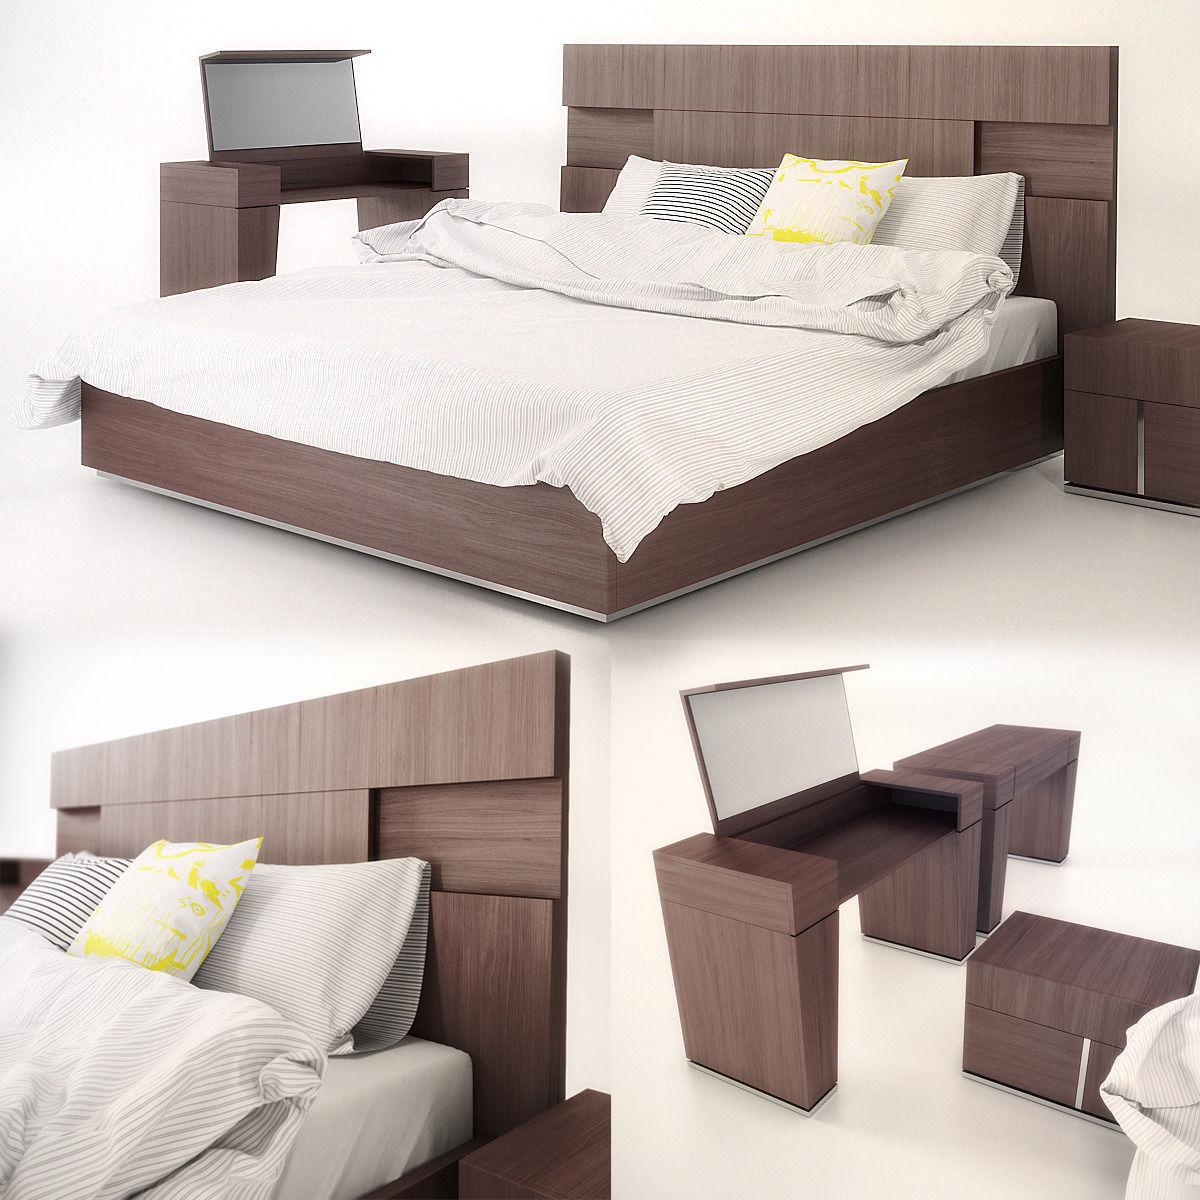 Modern Bedroom Bedding Modern Bed With Bedding 1 3d Model Max Fbx Cgtradercom